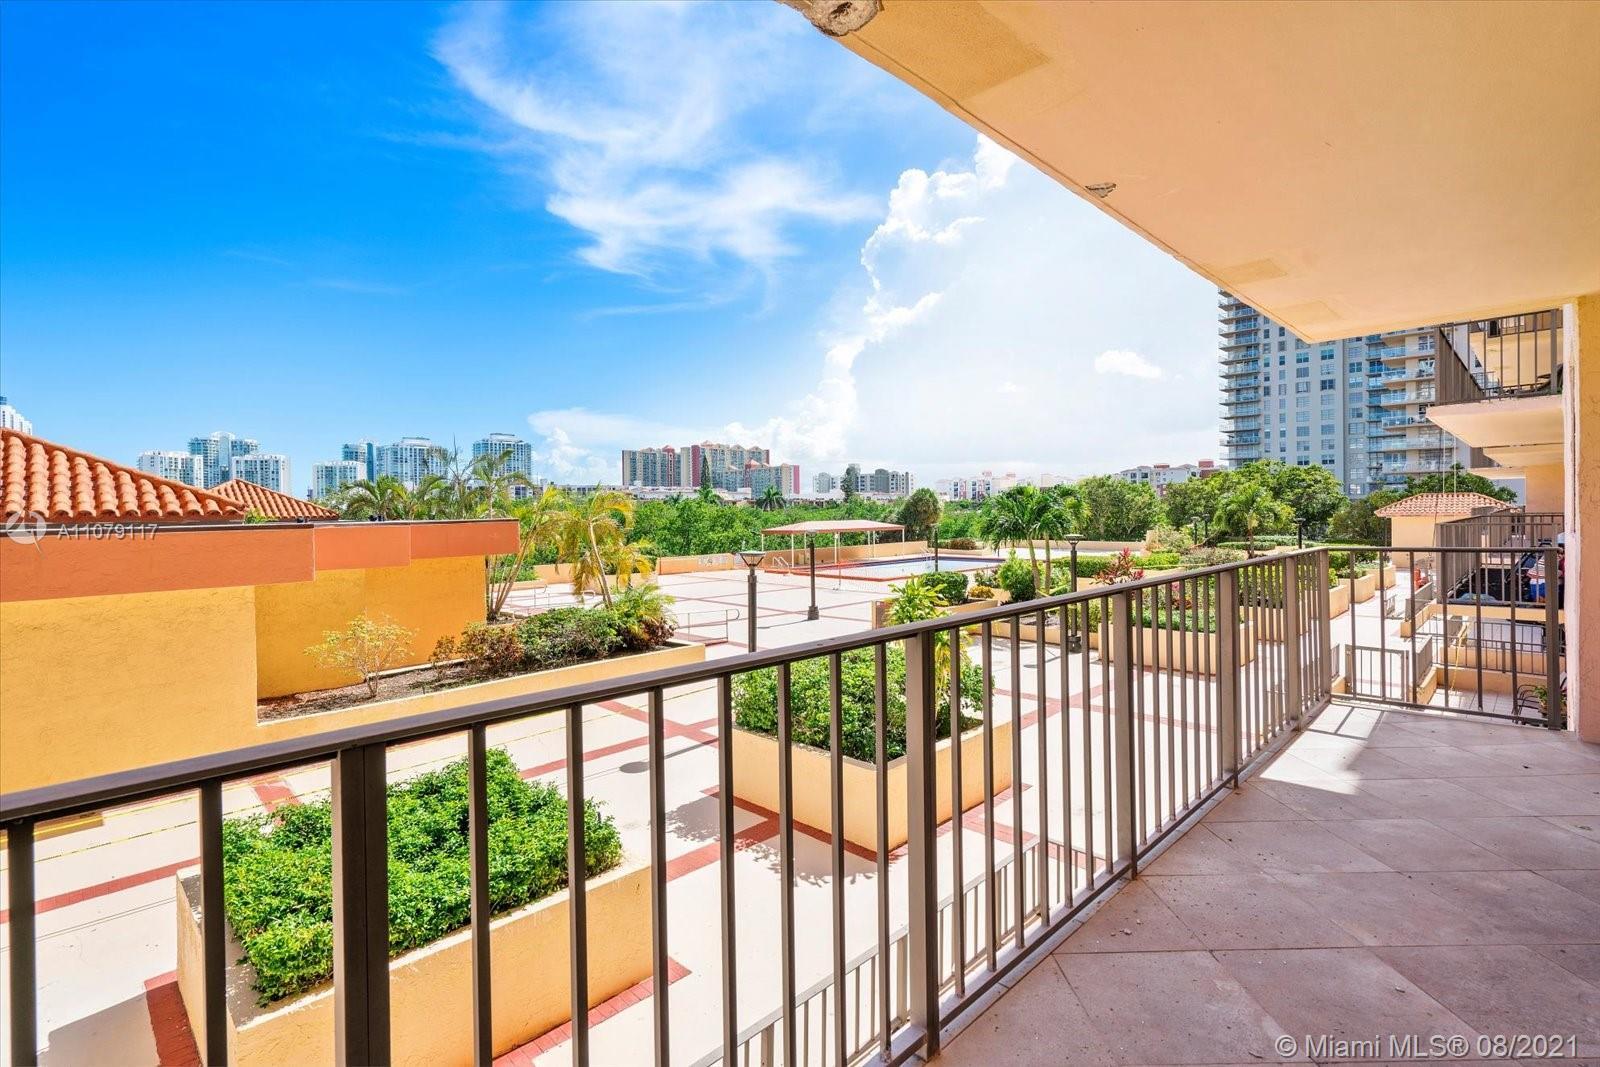 Winston Tower 600 #406 - 210 174th St #406, Sunny Isles Beach, FL 33160